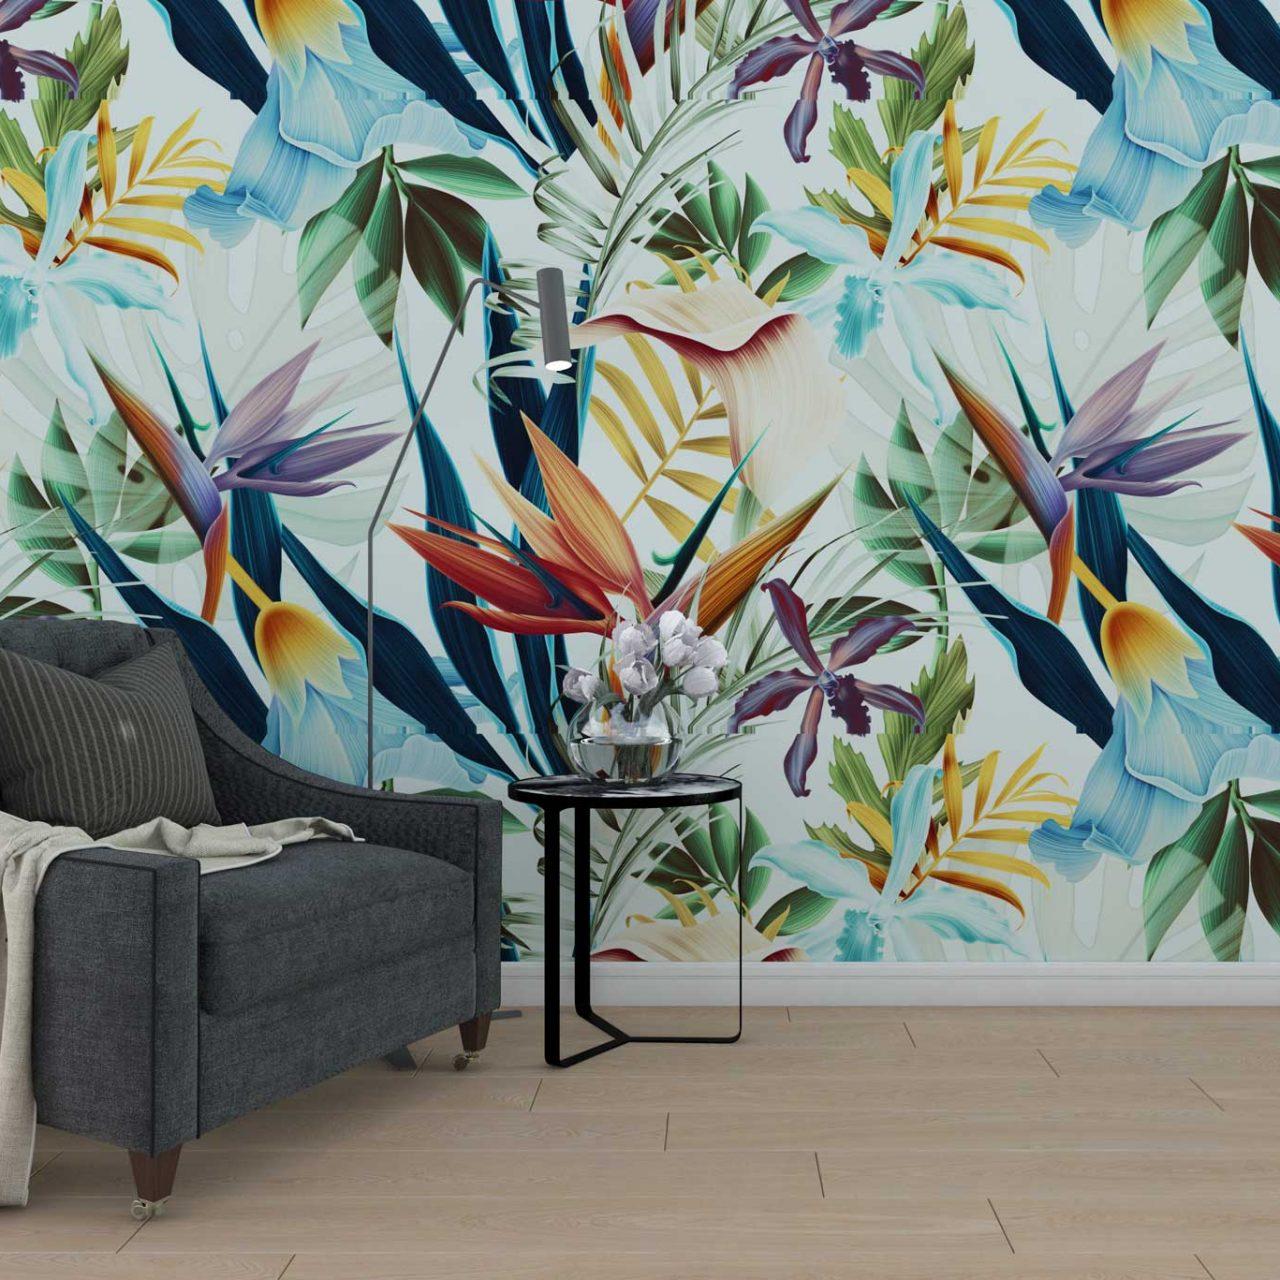 http://daringprints.ro/wp-content/uploads/2020/12/tapet-fototapet-design-personalizat-comanda-customizabil-bucuresti-daring-prints-flori-model-motiv-vegetal-frunze-exotic-multicolor-colorat-1280x1280.jpg